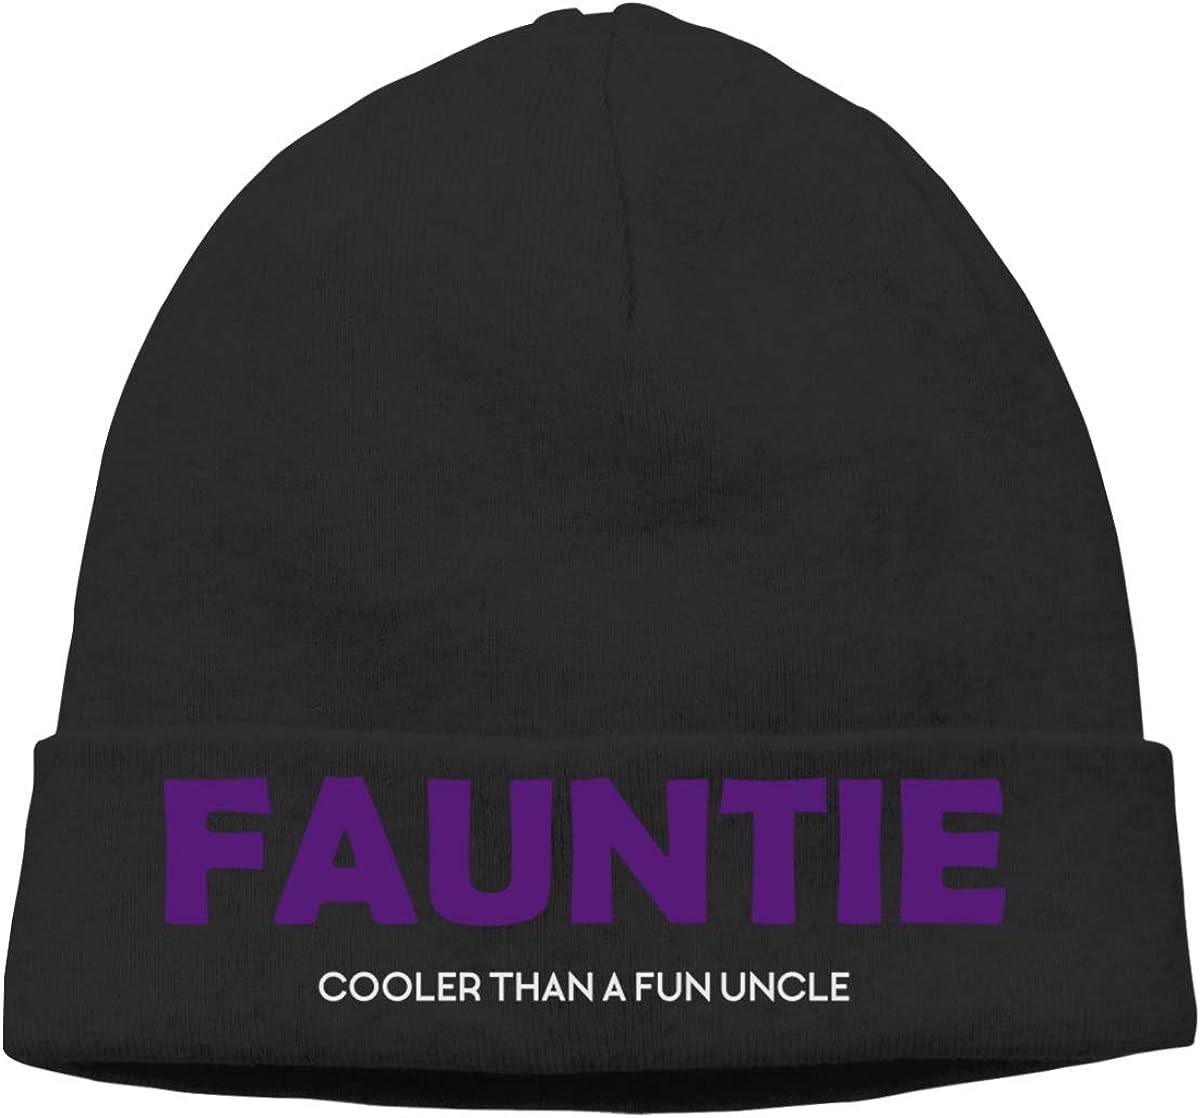 Riokk az Fauntie Cooler Than A Fun Uncle Beanie Hats Skull Caps for Mens Black